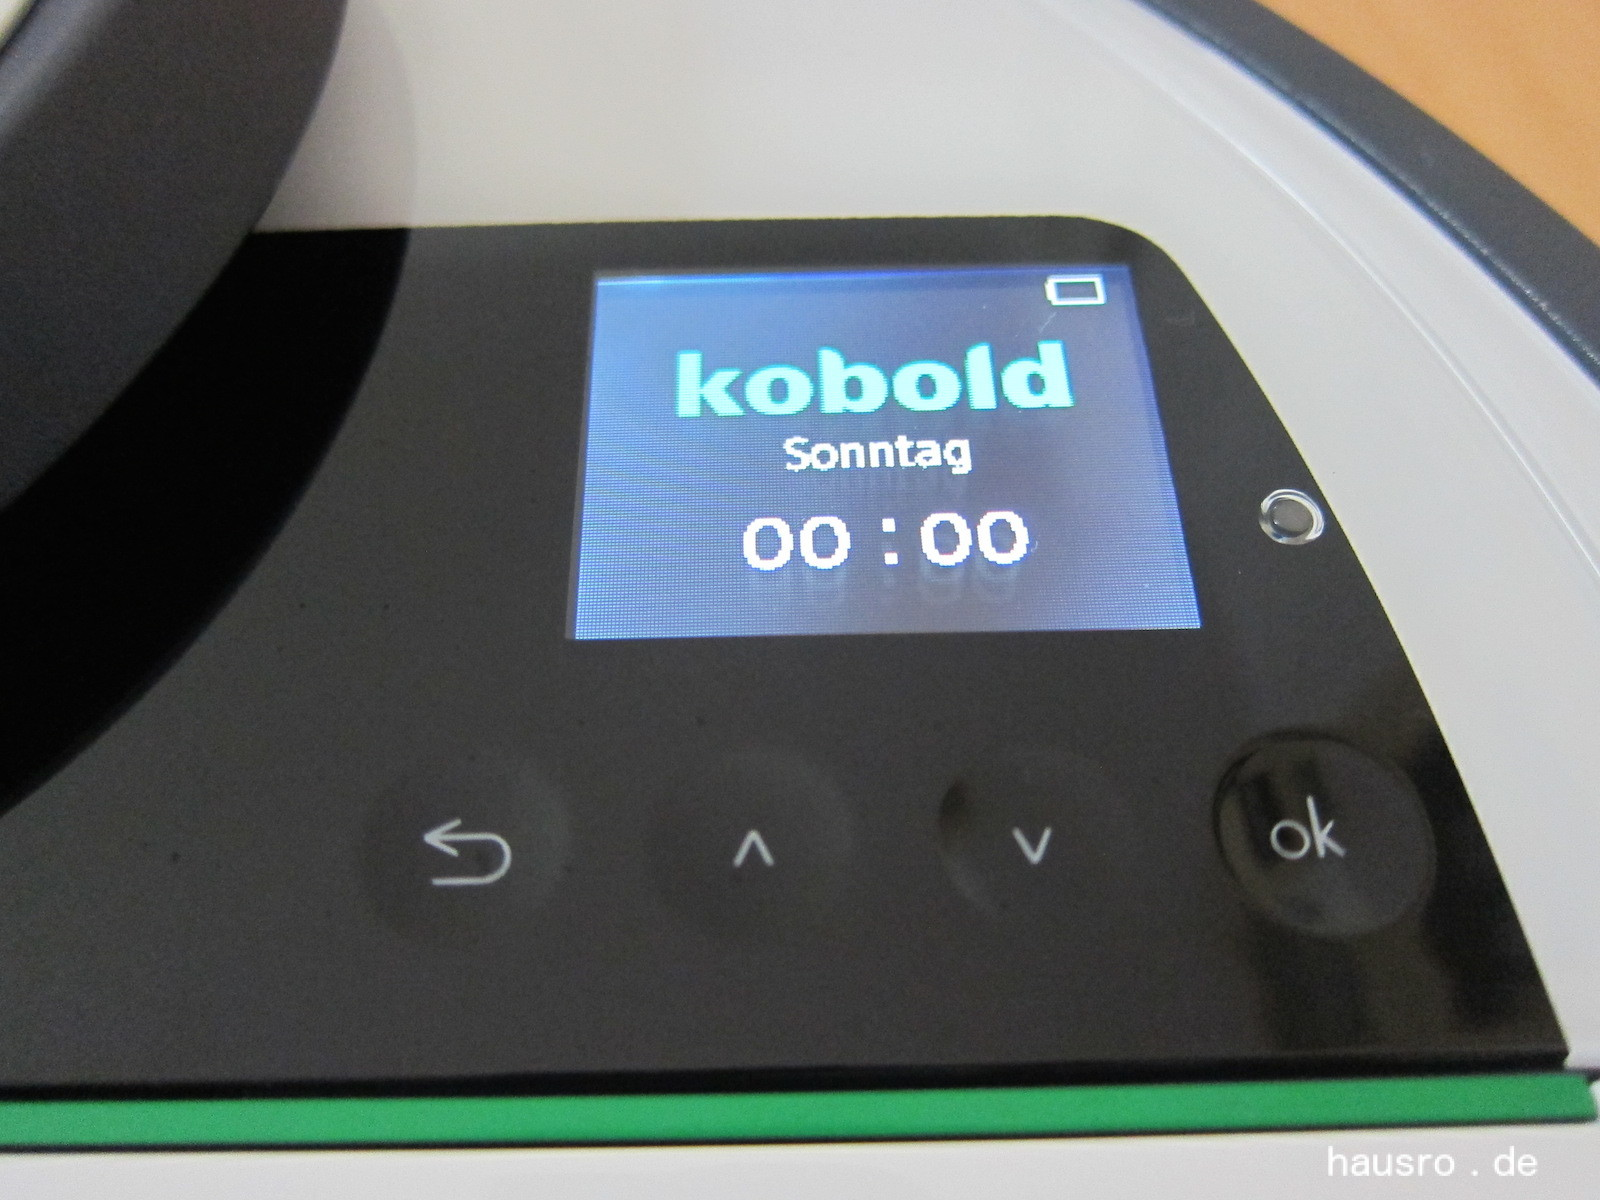 display vorwerk kobold vr200 akku und roboter staubsauger. Black Bedroom Furniture Sets. Home Design Ideas